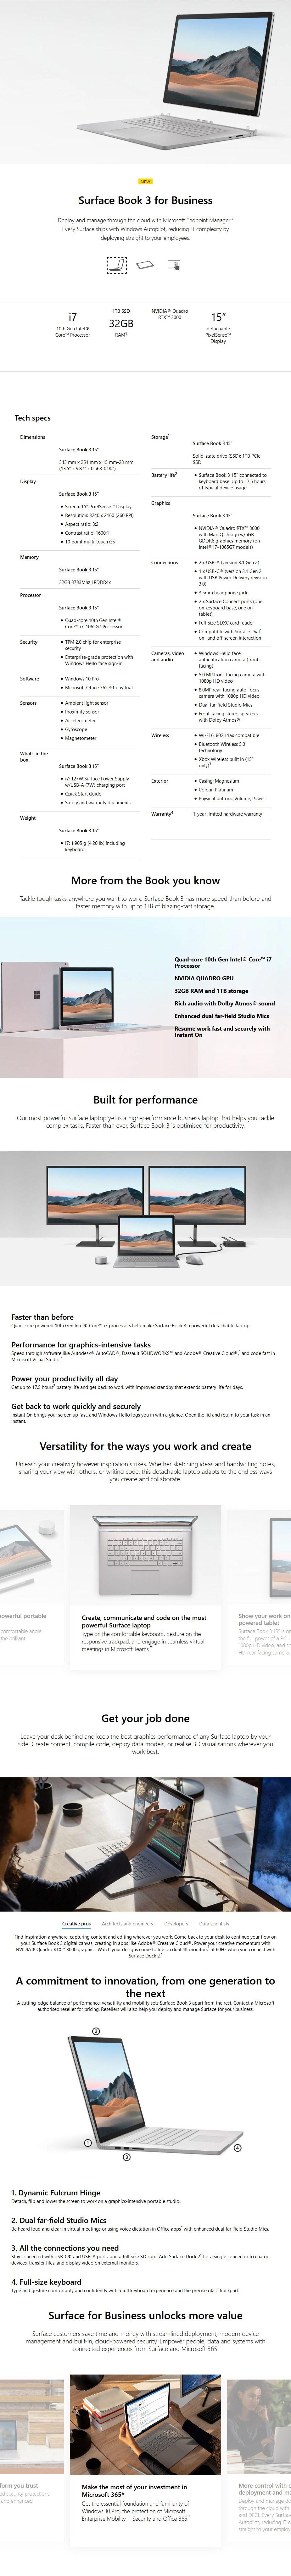 "Microsoft Surface Book 3 15"" i7-1065G7 32GB 1TB Nvidia Quadro RTX 3000 W10P - Overview 1"